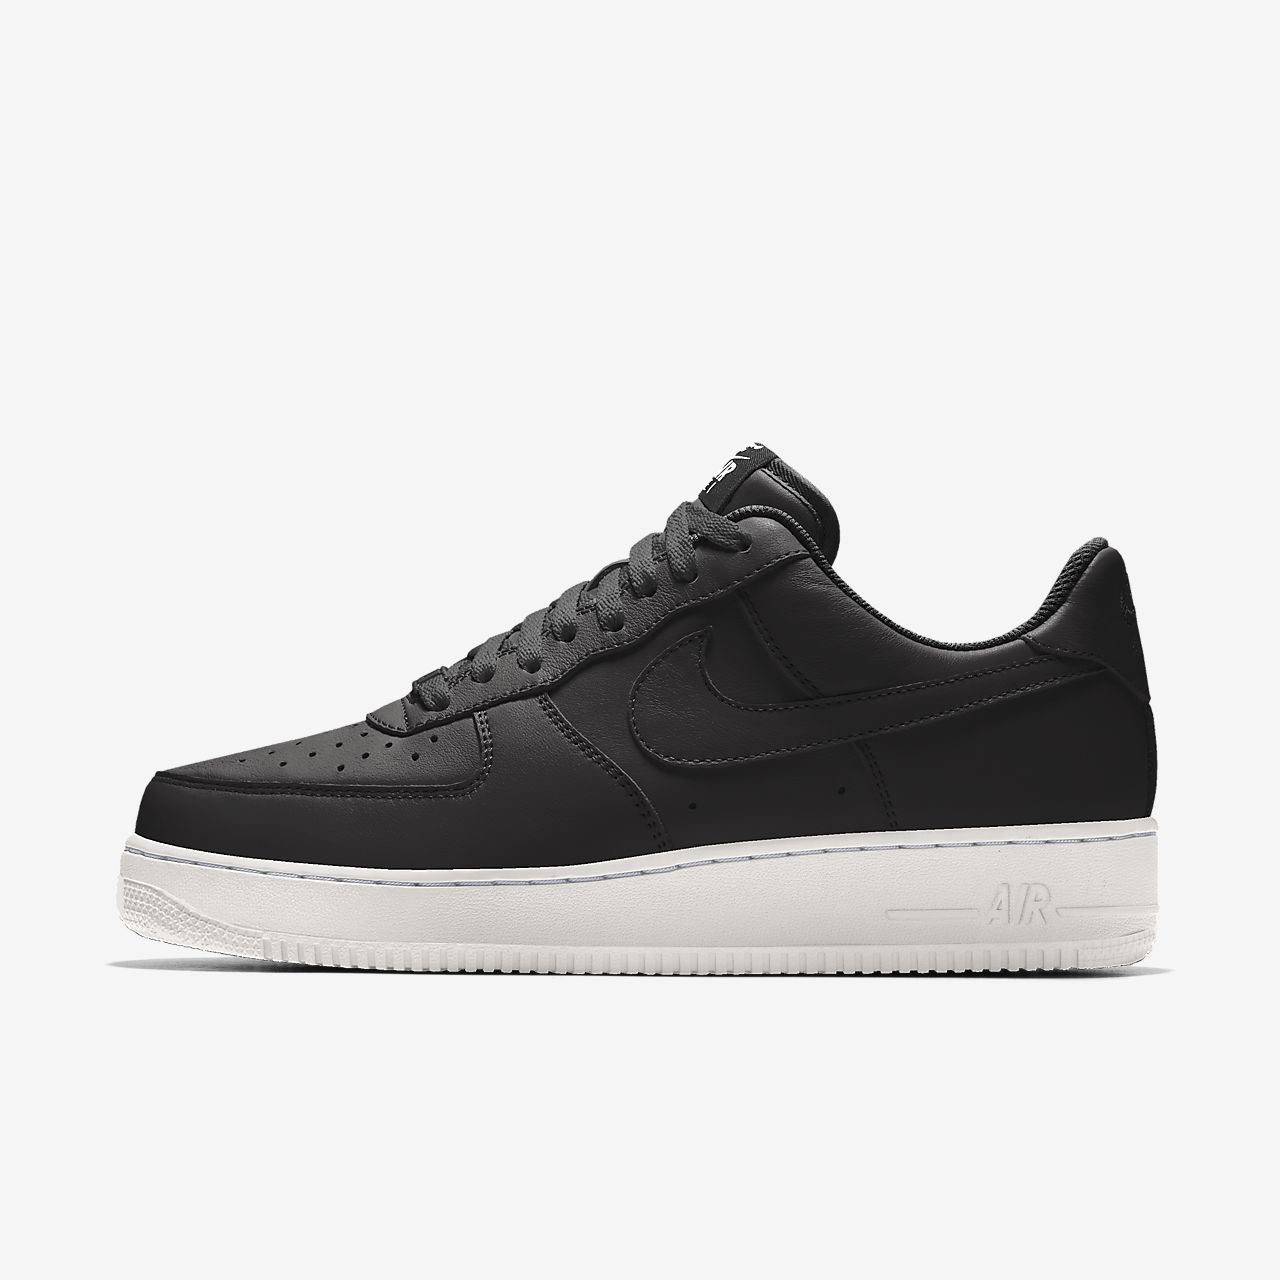 Calzado para mujer personalizado Nike Air Force 1 Low By You